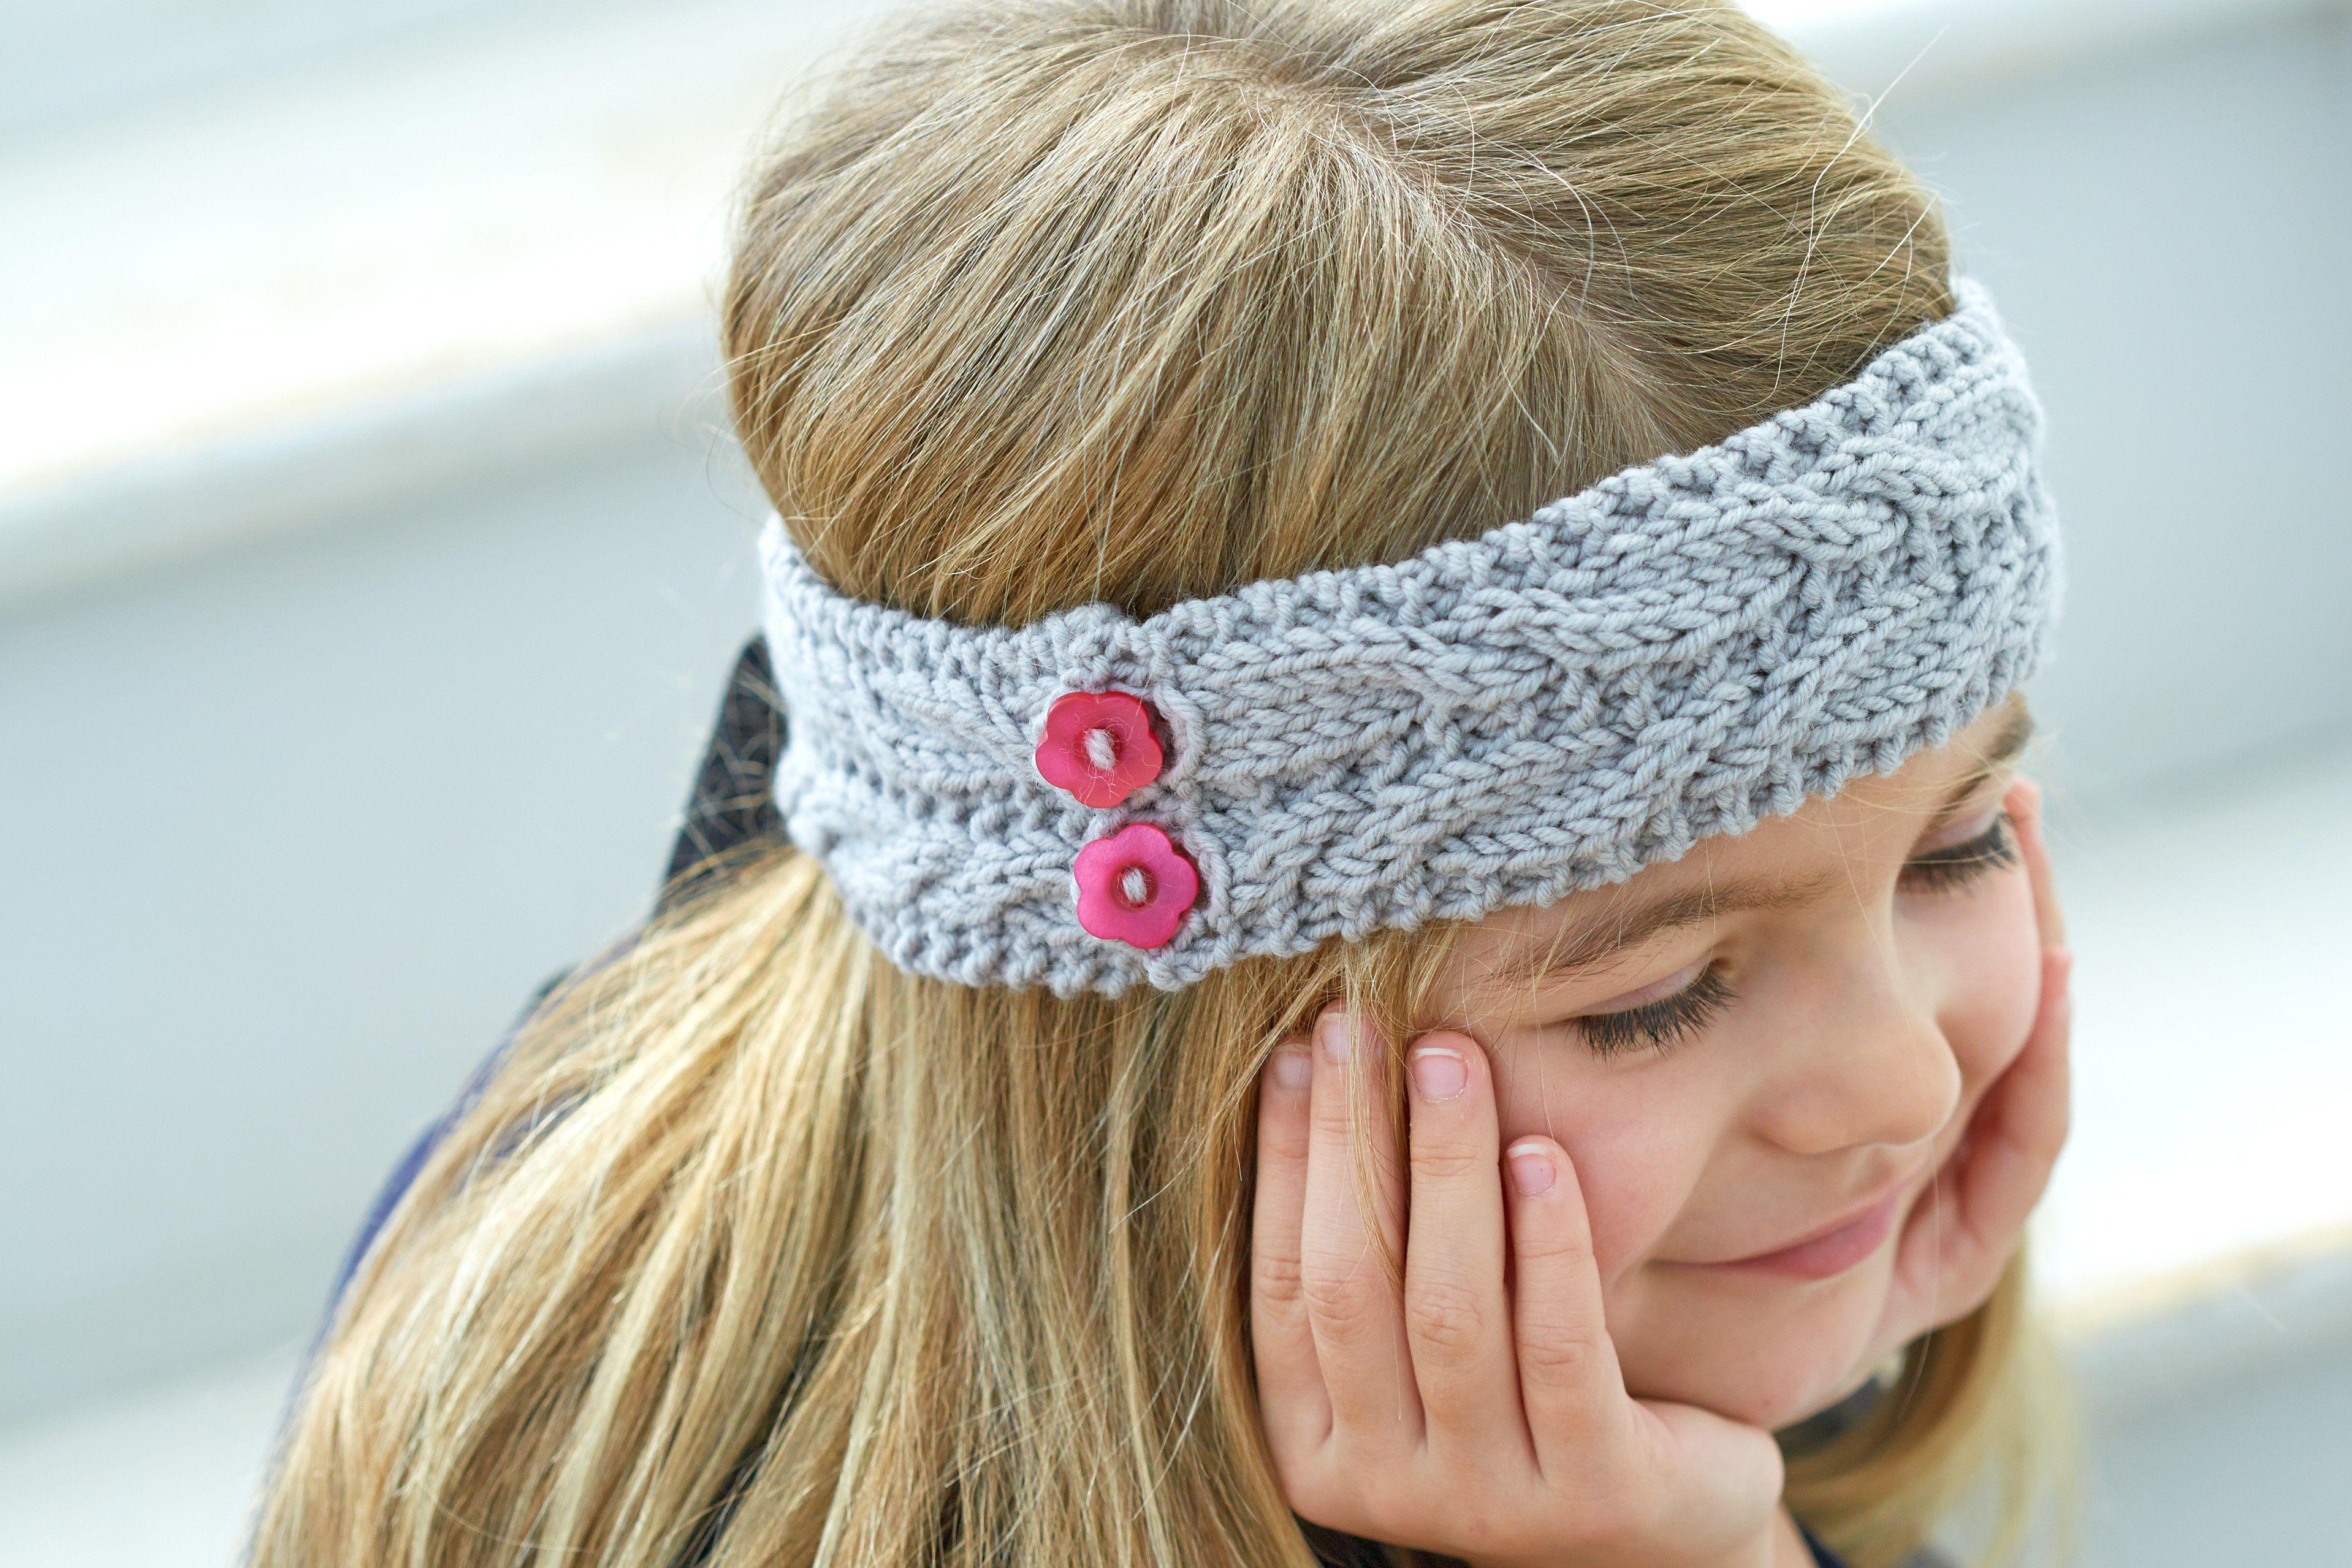 A little girl wearing a braided ear warmer variation